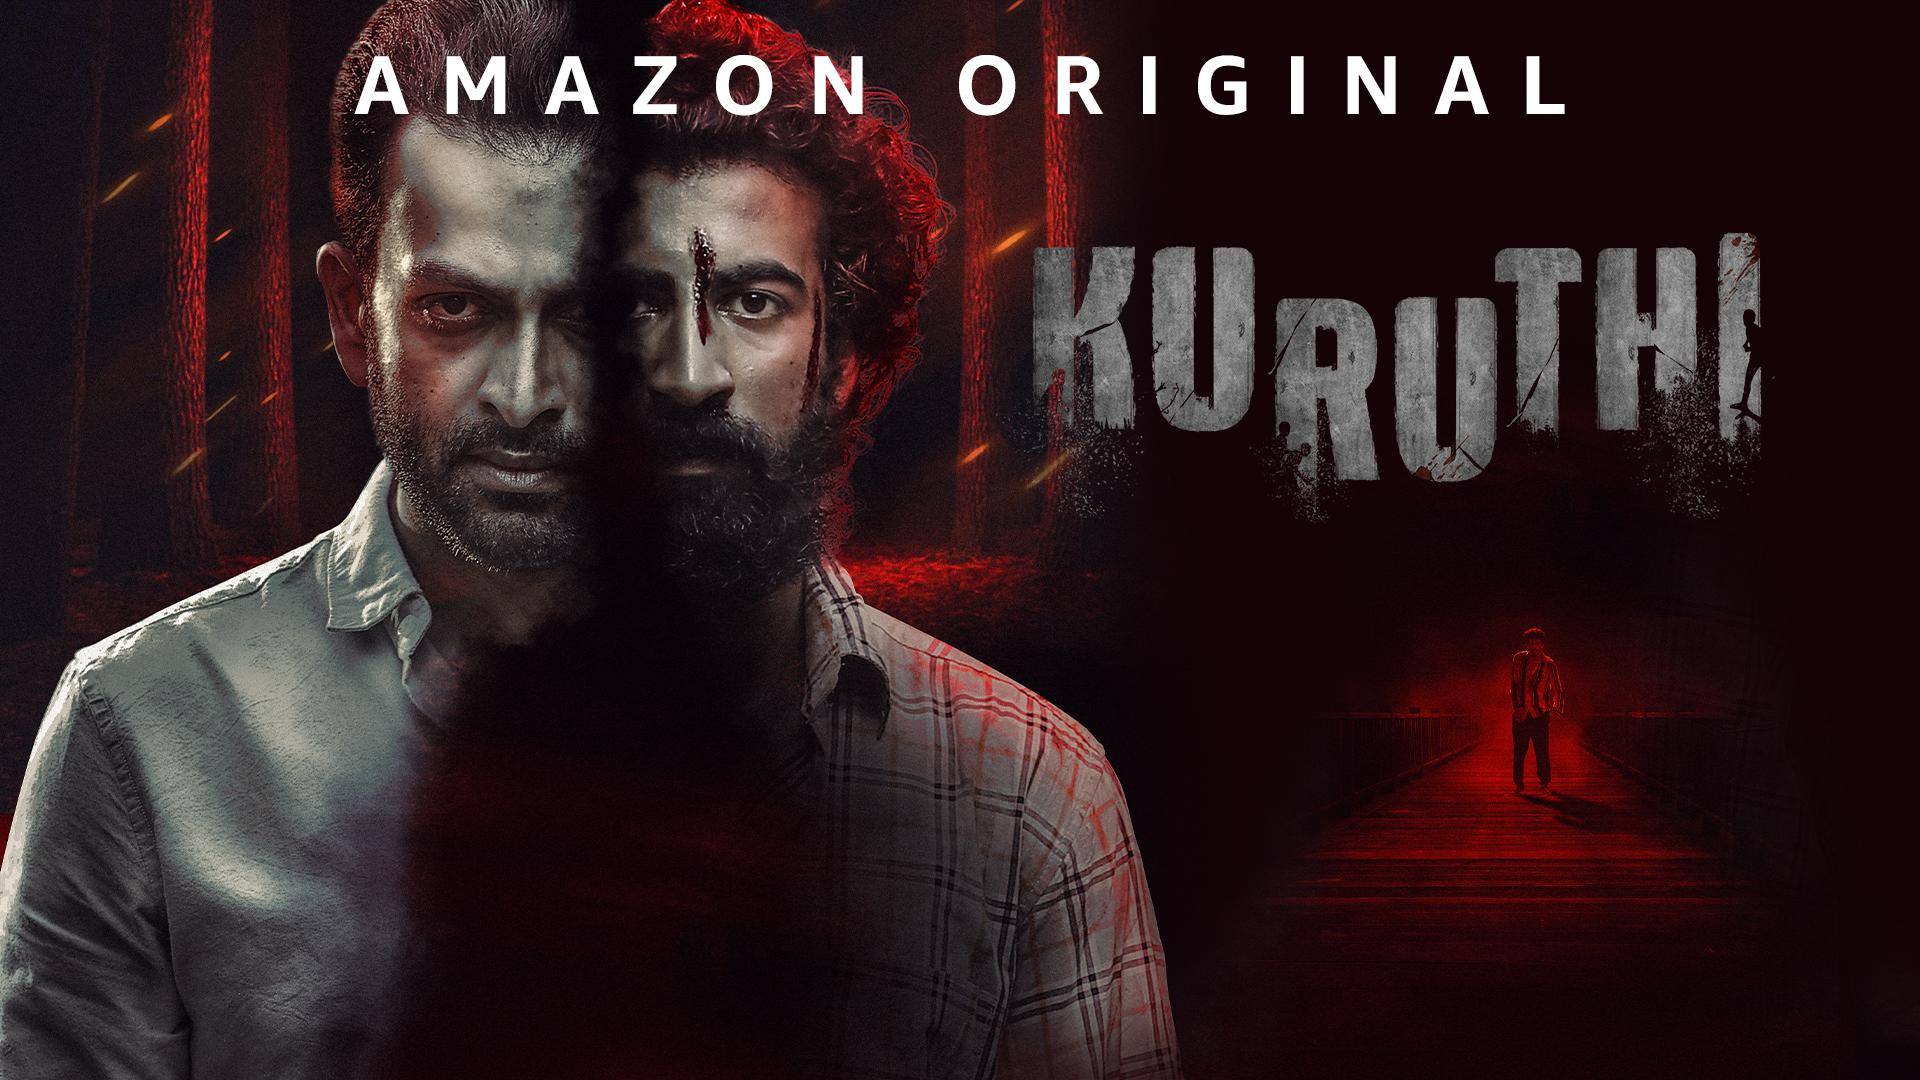 Kuruthi